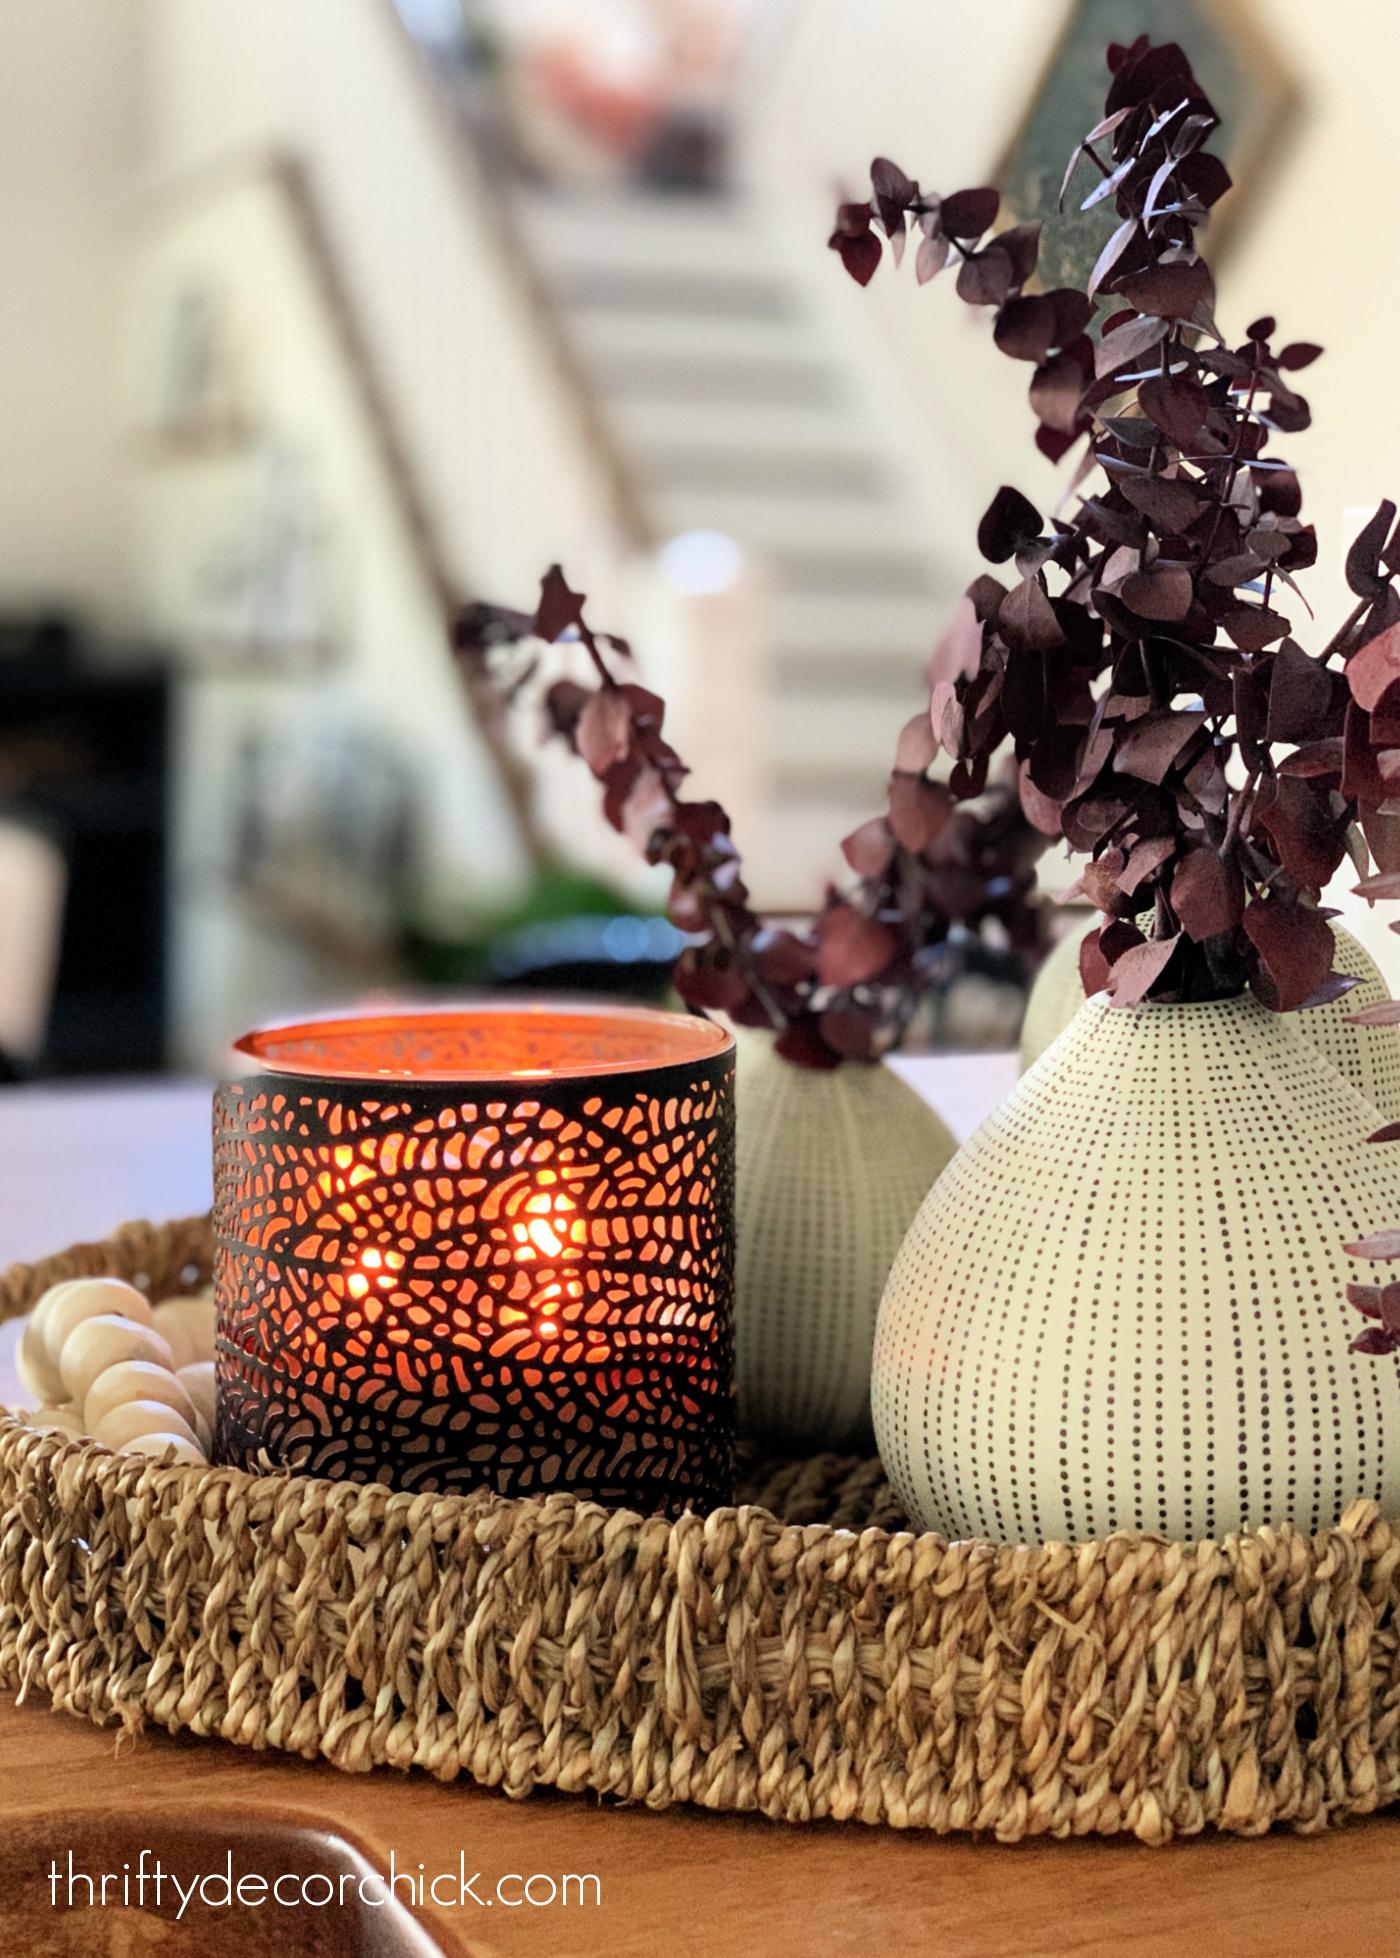 Stone vase, metal candle in rattan basket